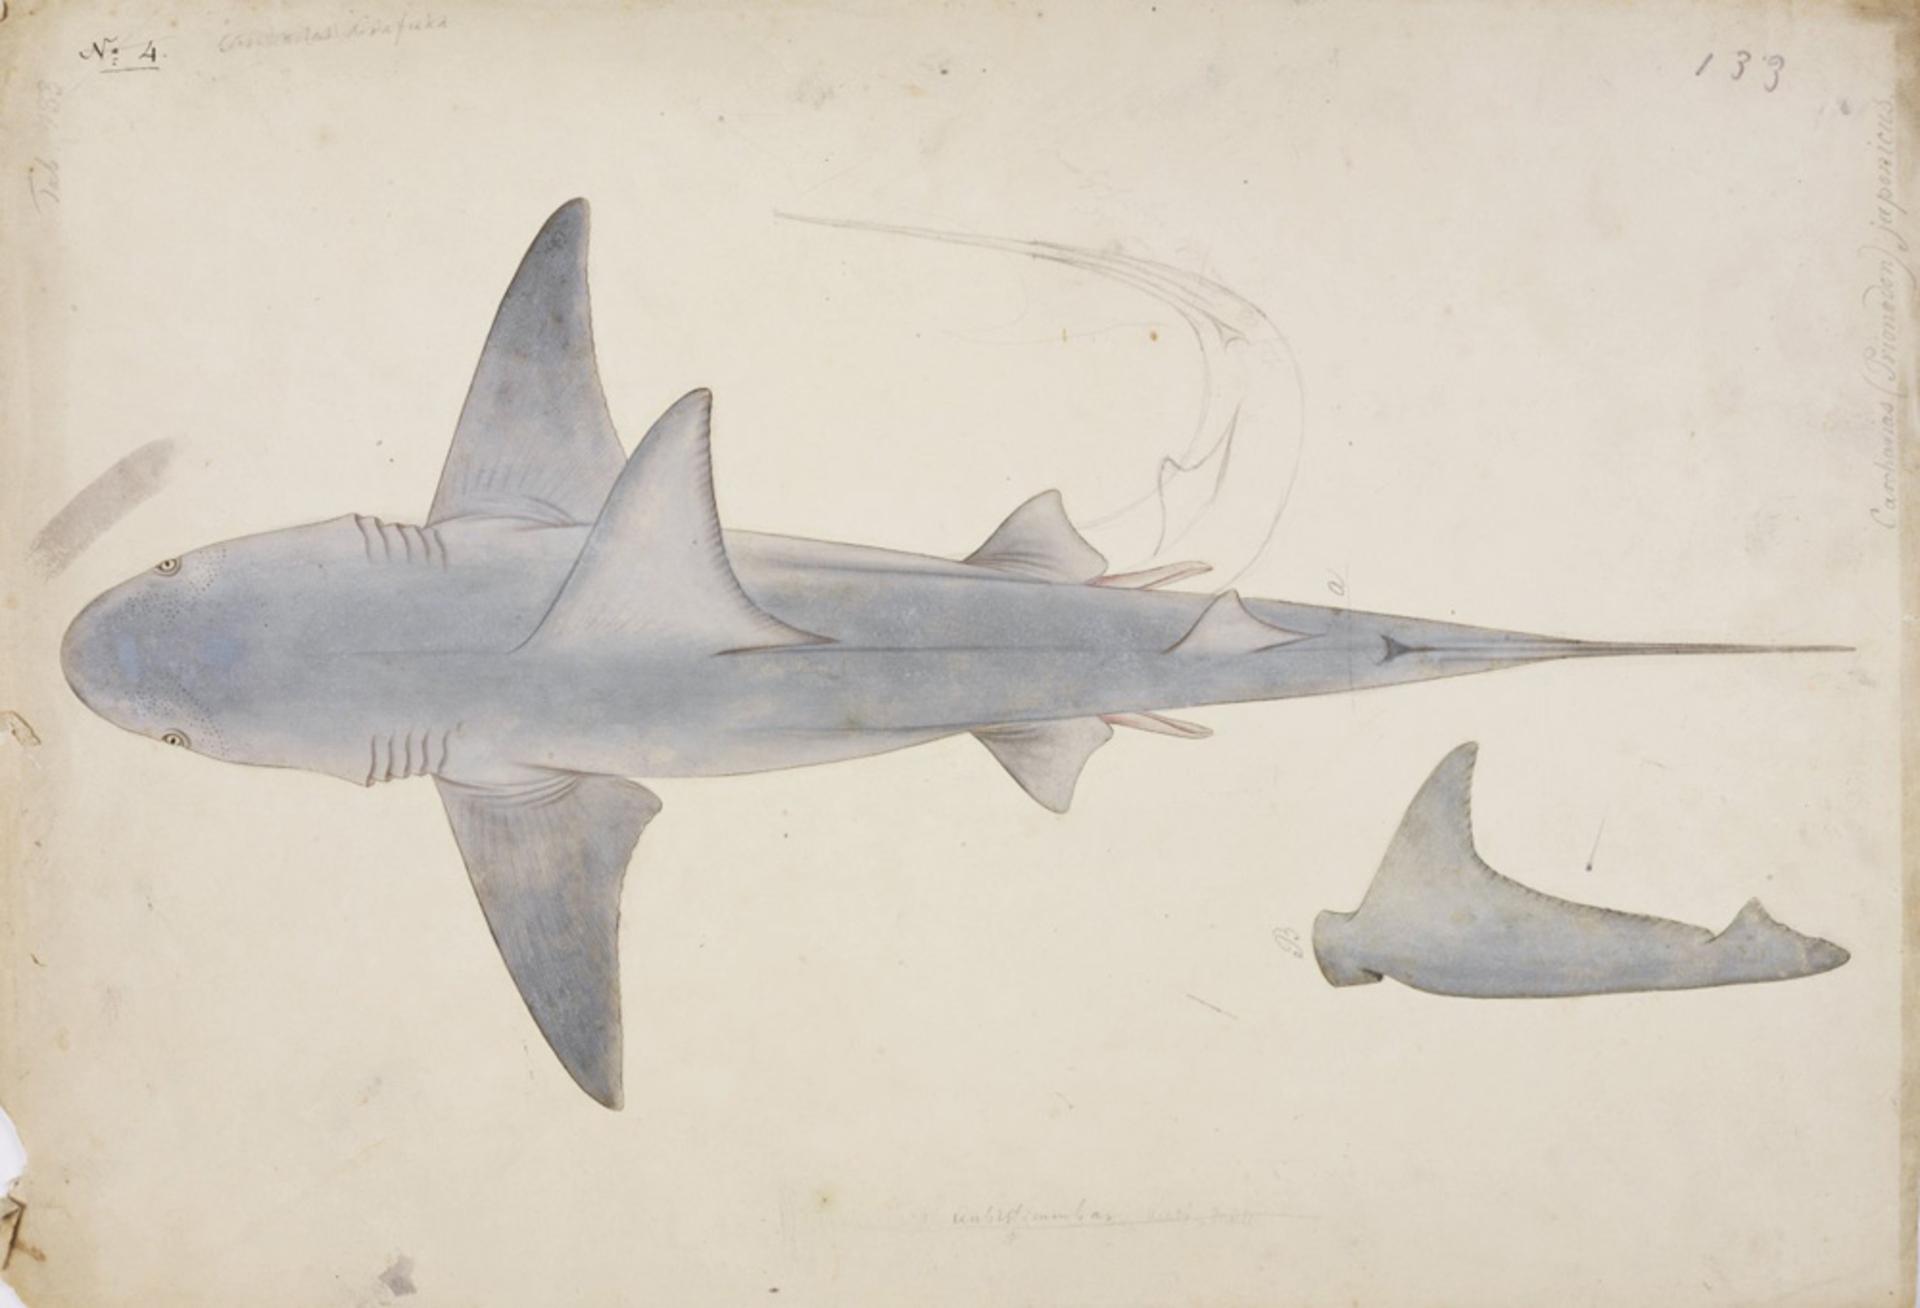 RMNH.ART.45 | Carcharhinus gangeticus